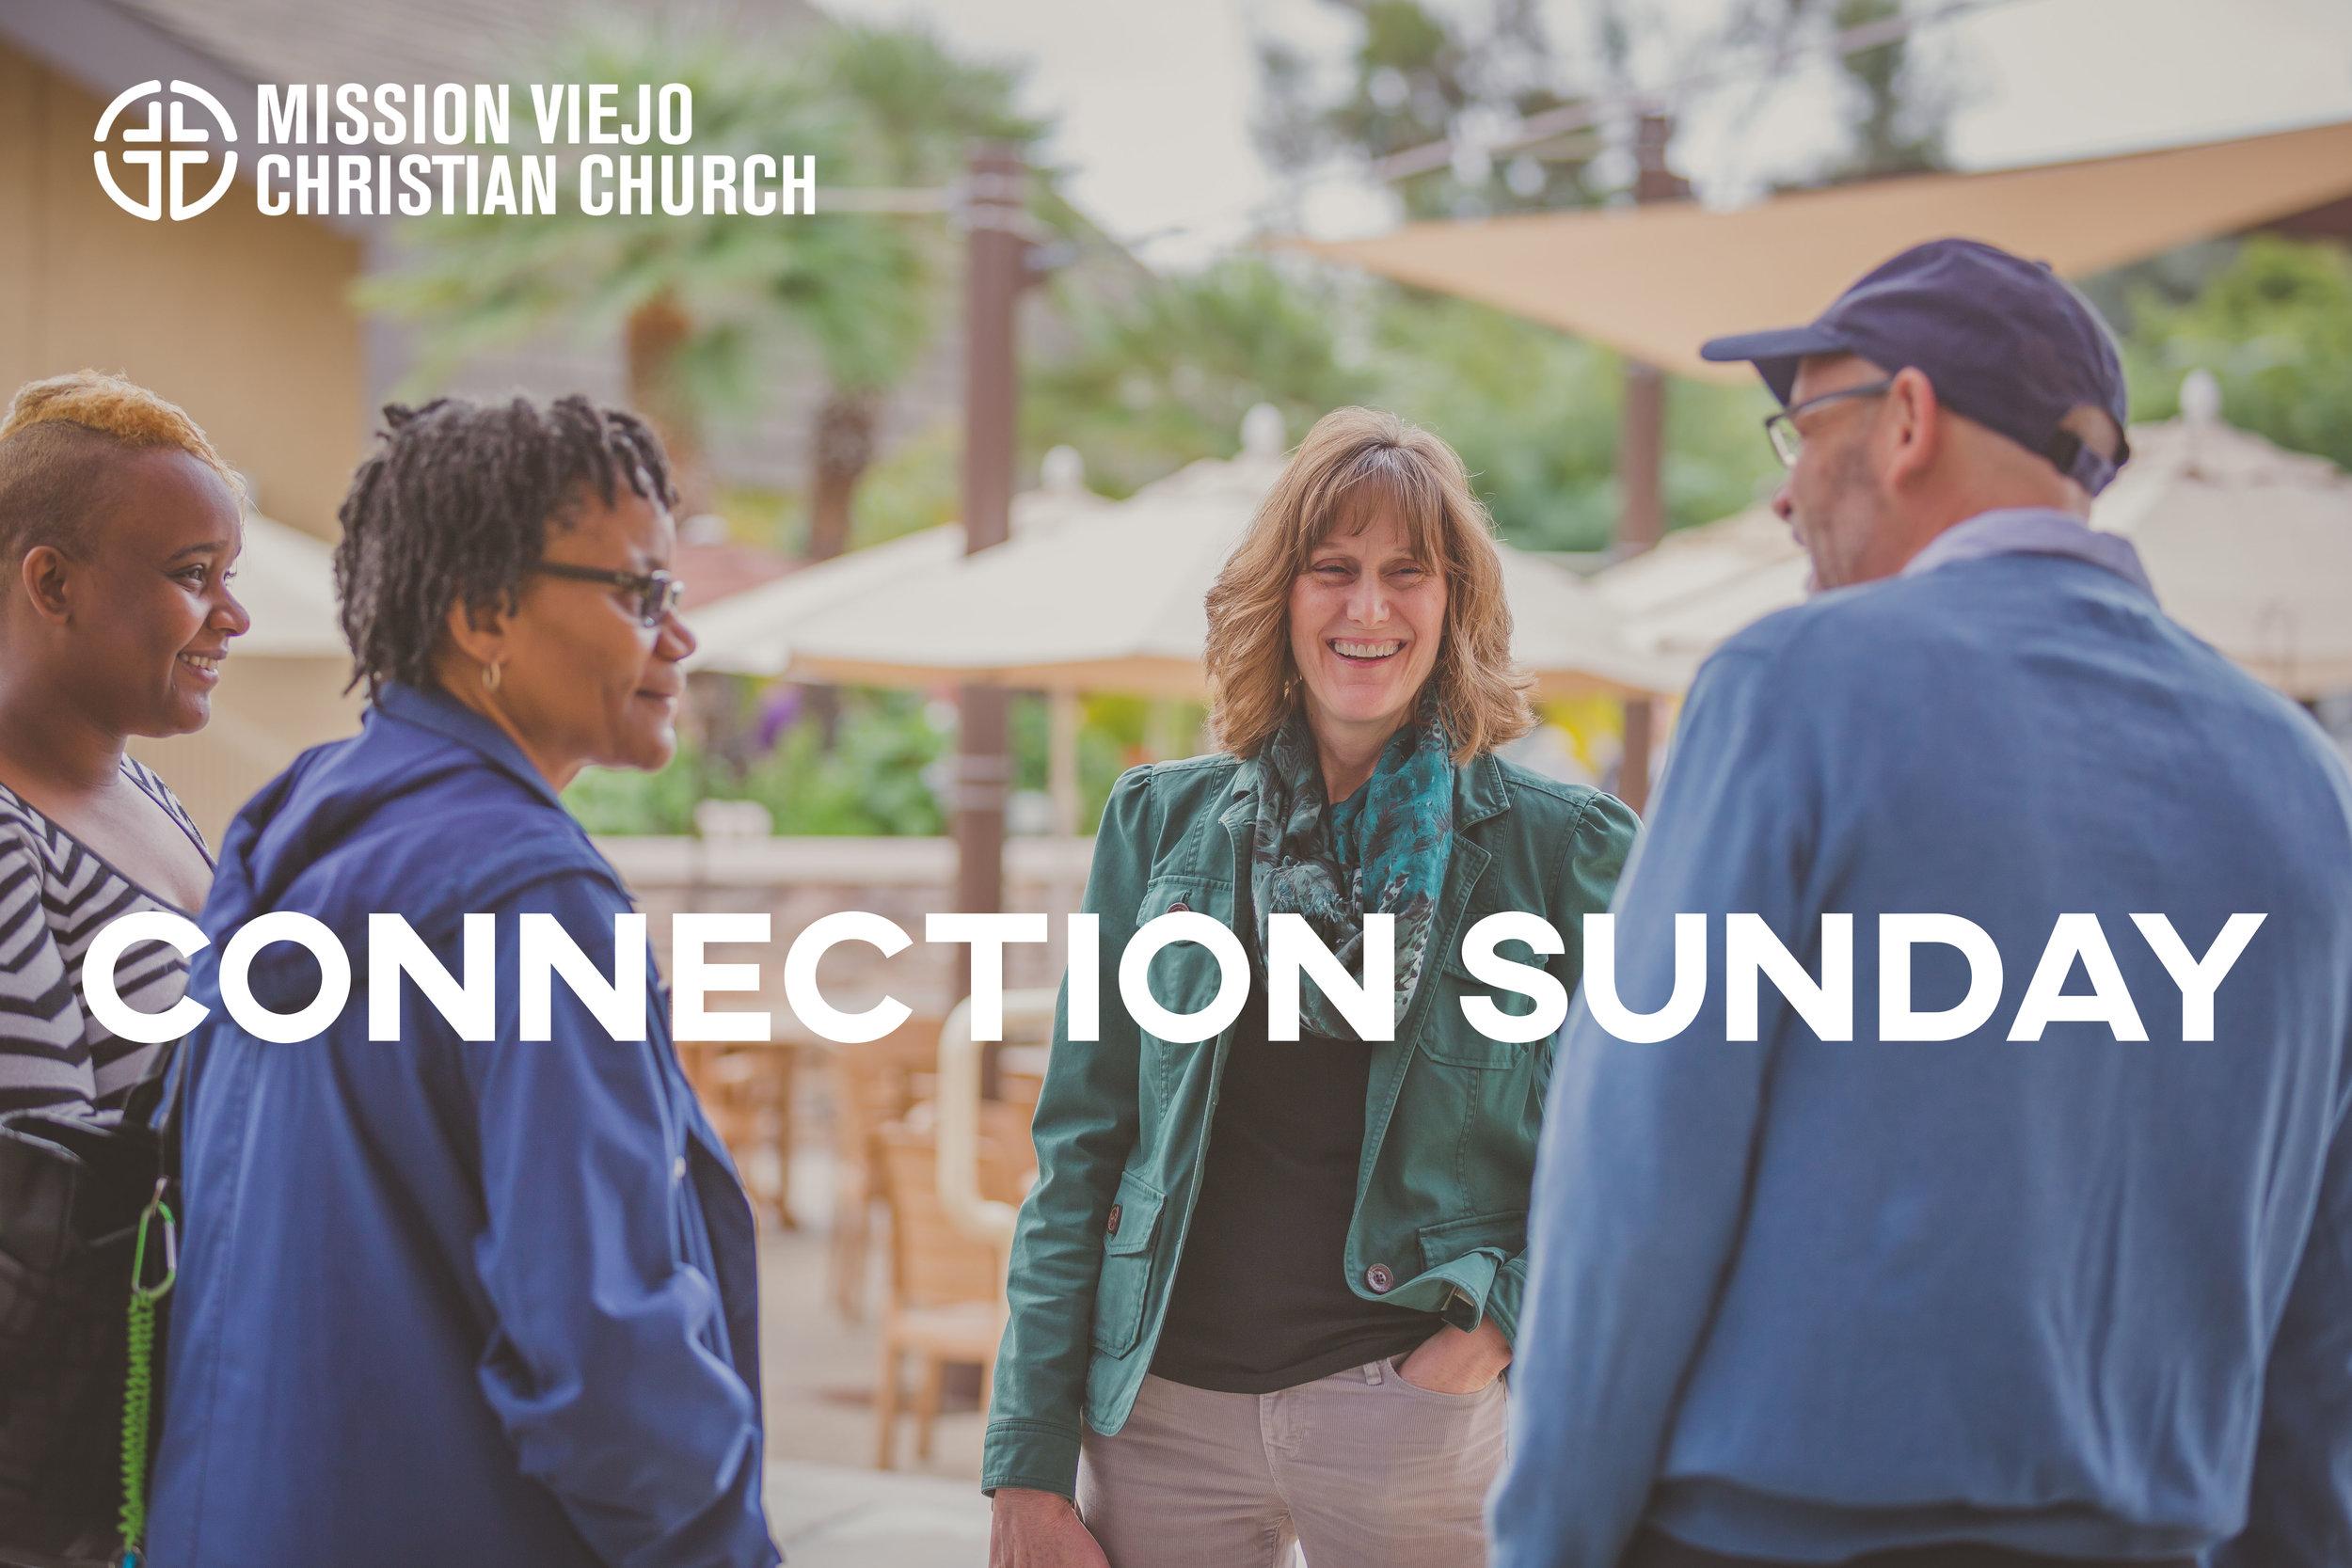 ConnectionSunday.jpg